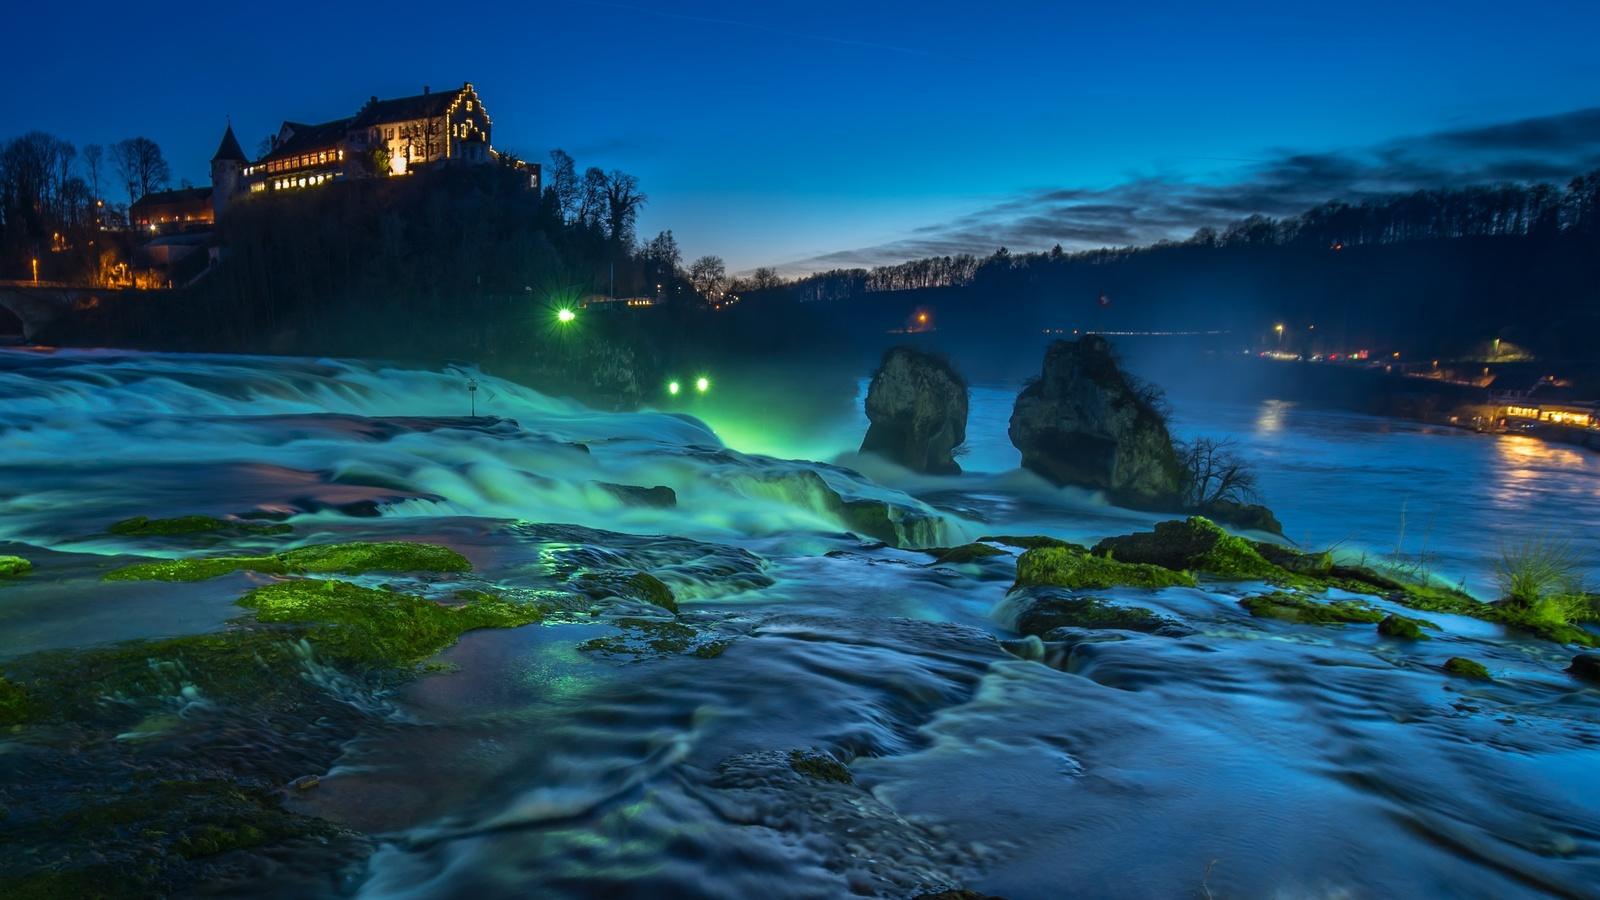 водопад, рейн, водопад, шаффхаузен, швейцария